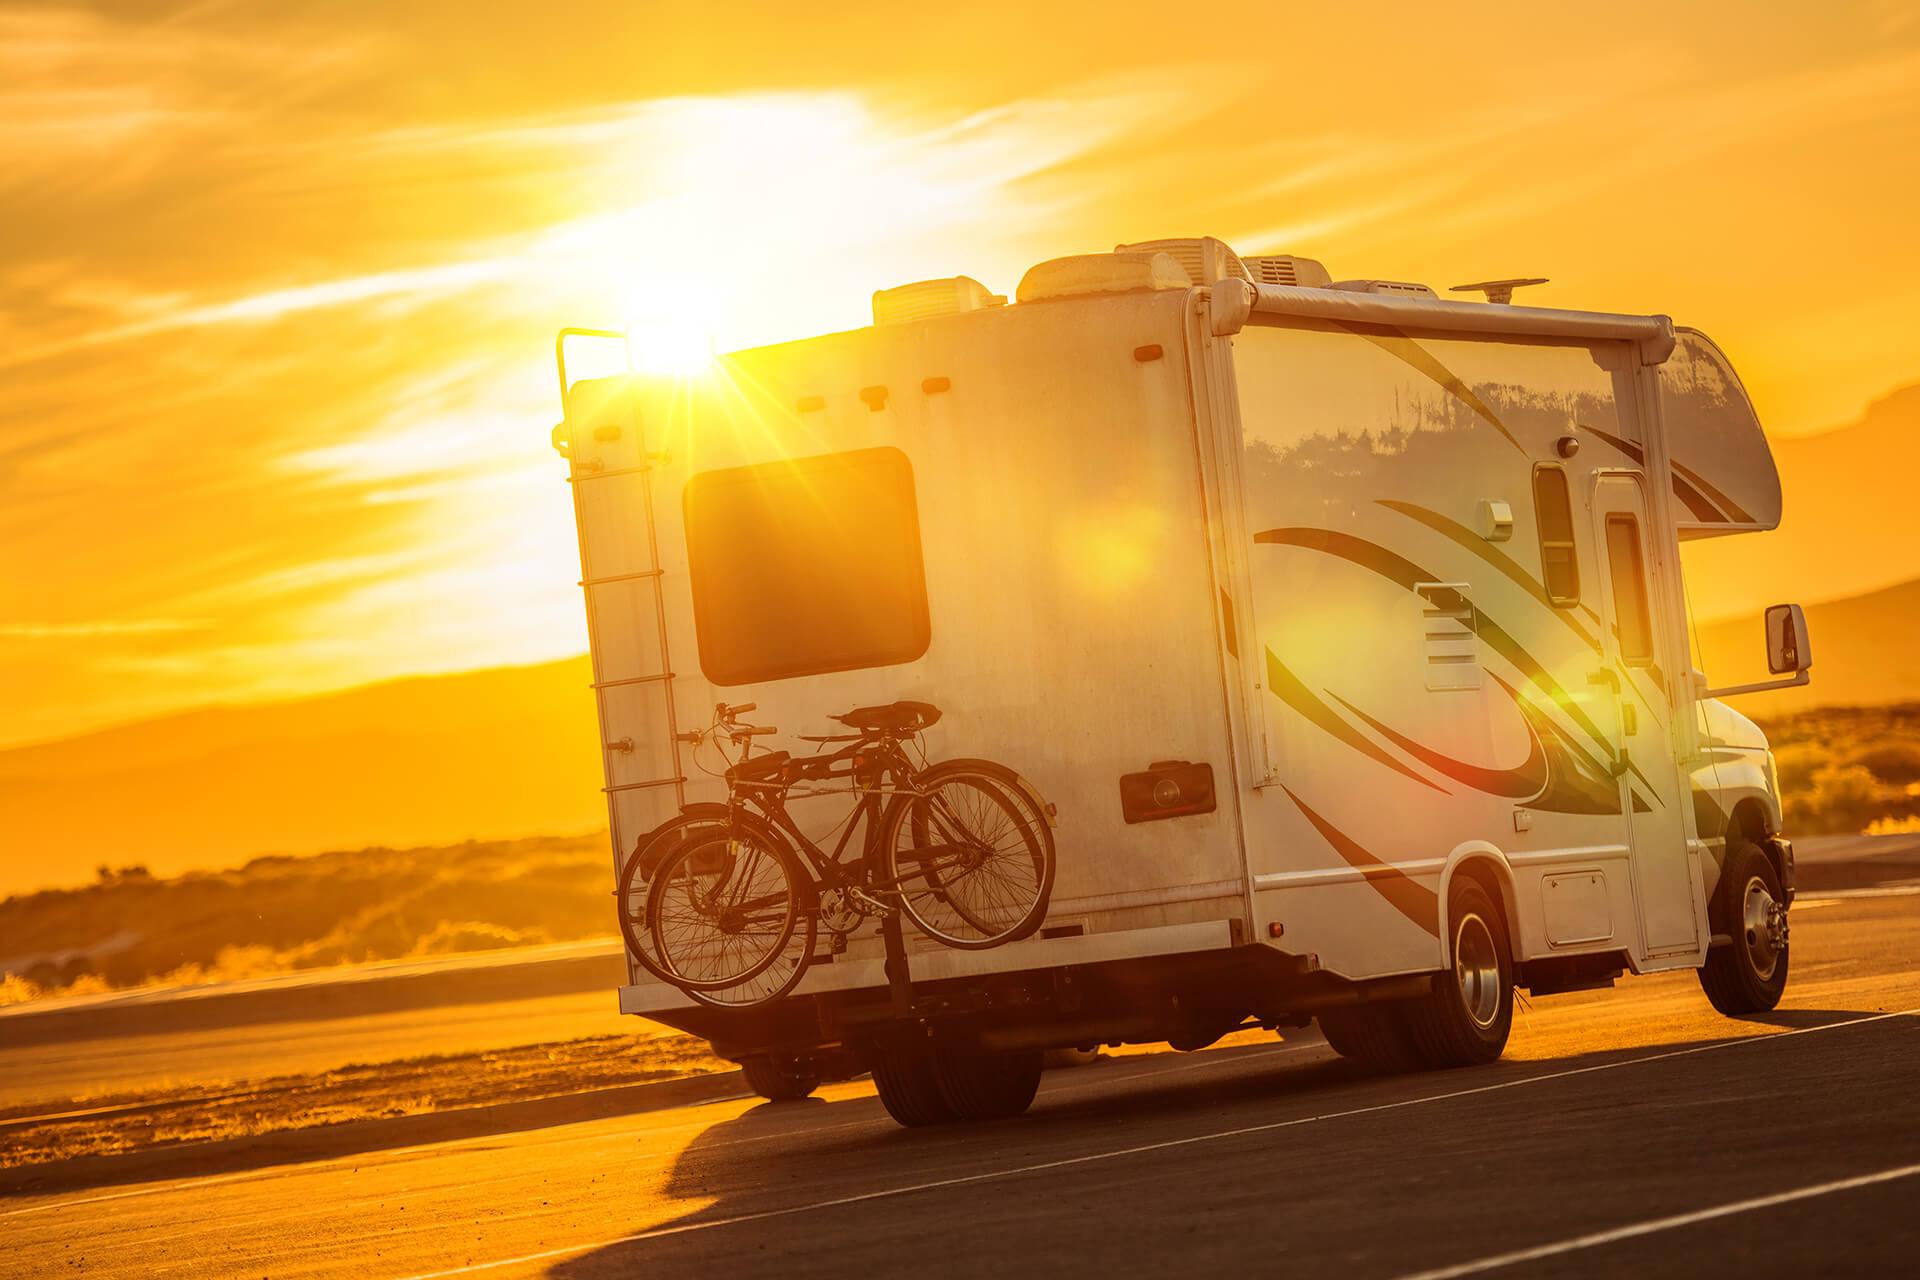 rv insurance Hardin County, motor home insurance Lumberton TX, Silsbee insurance agents, Hardin County inssurance agents,